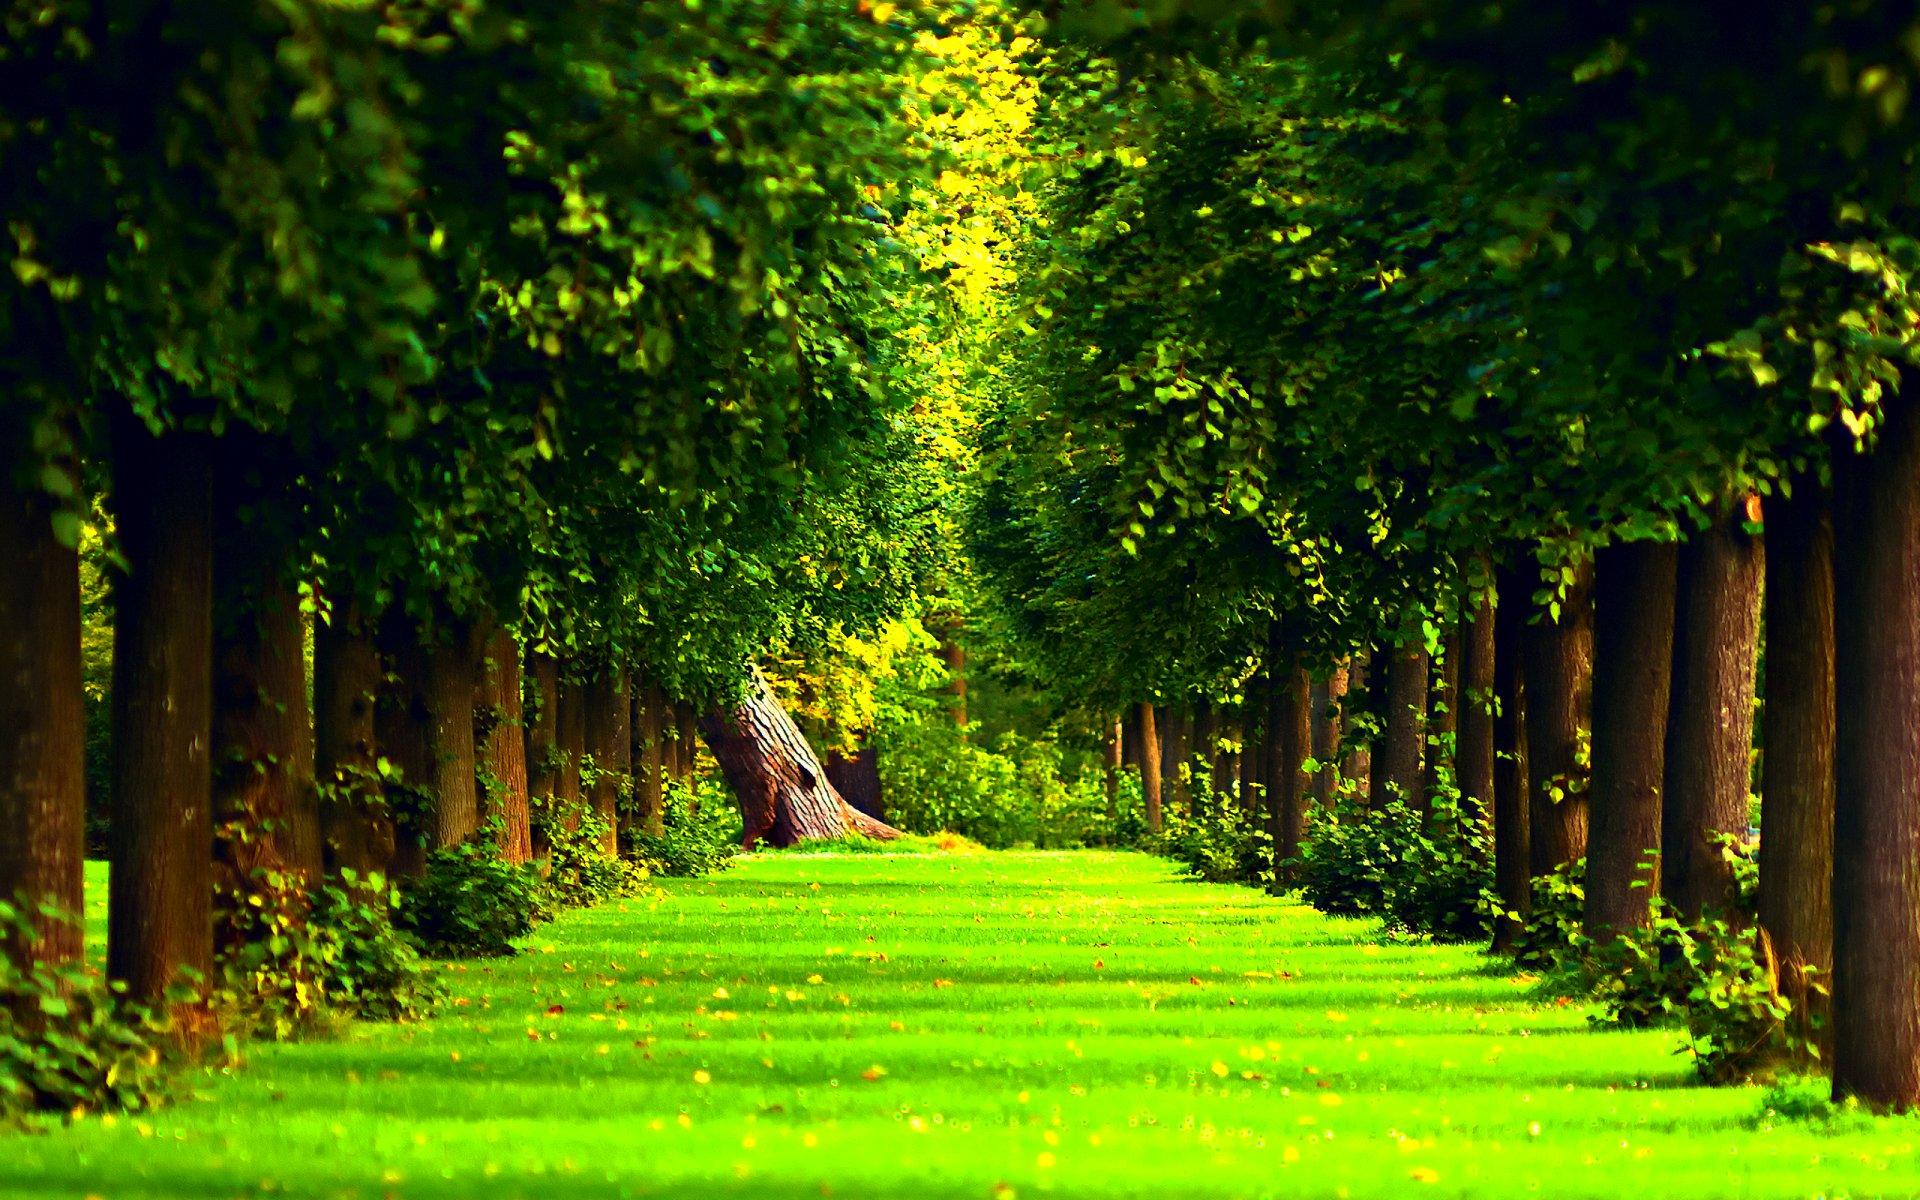 landscape nature tree litsva - photo #11